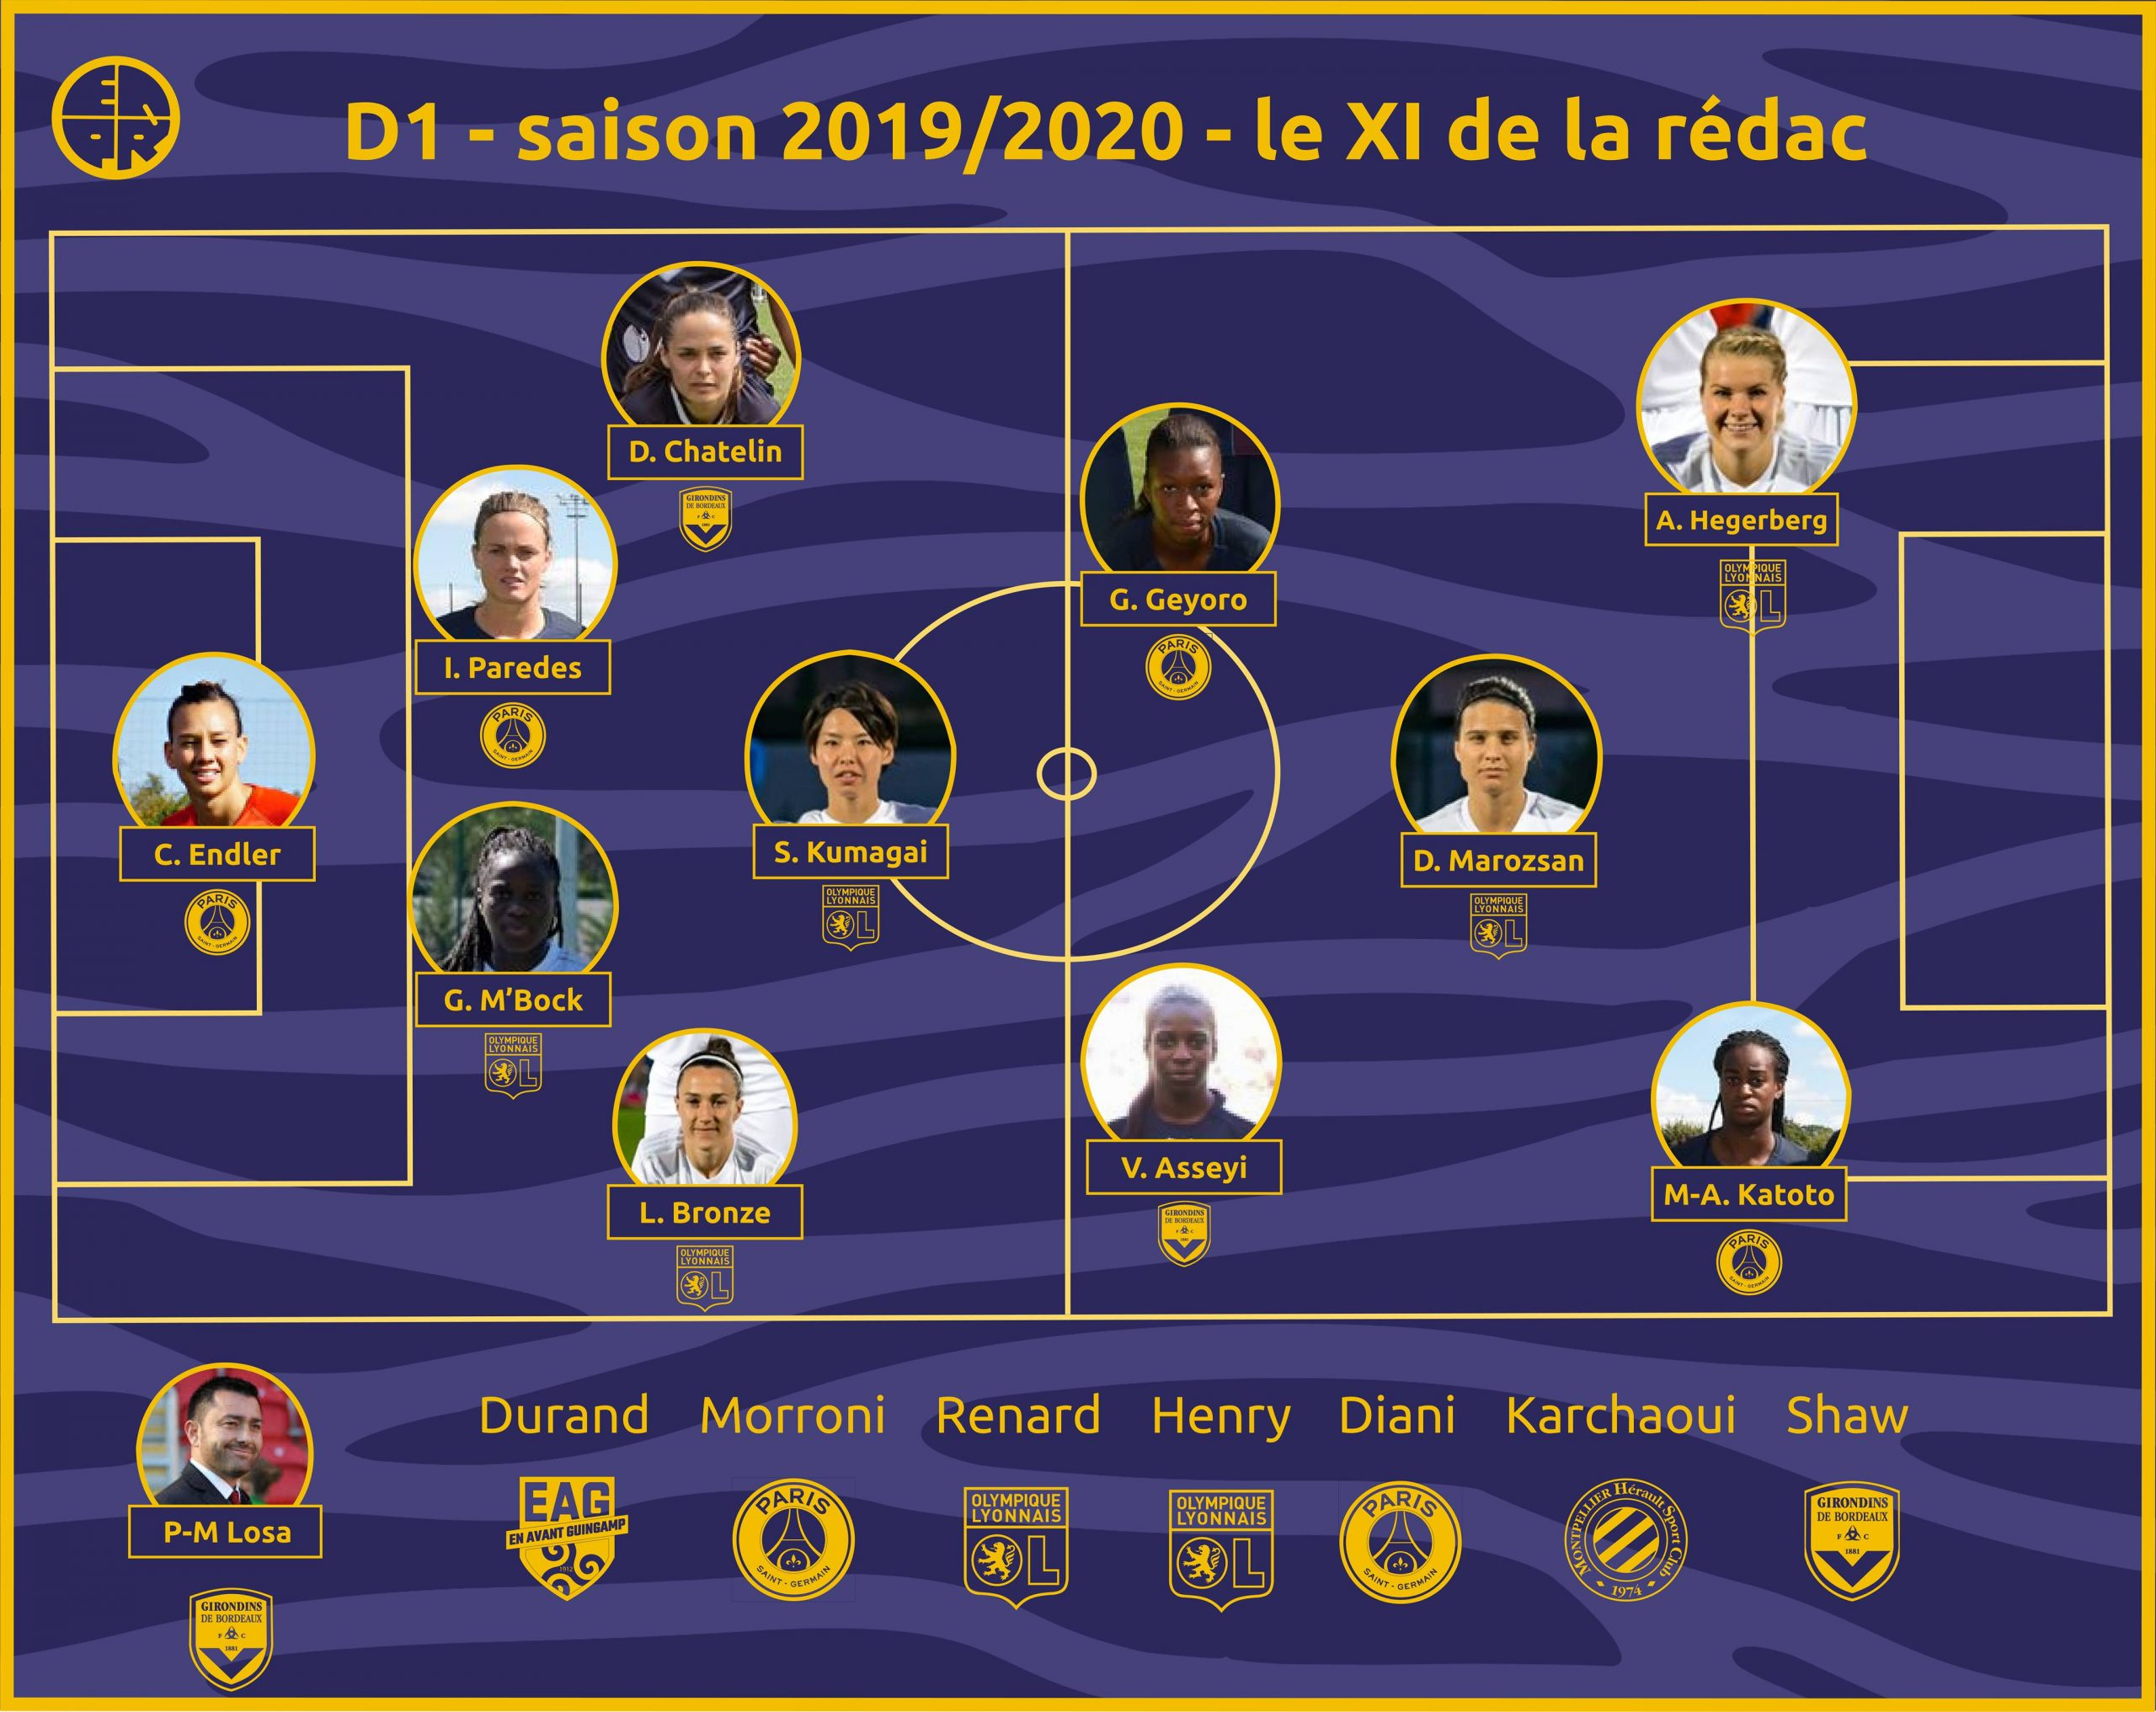 onze type saison 2019/2020 redac